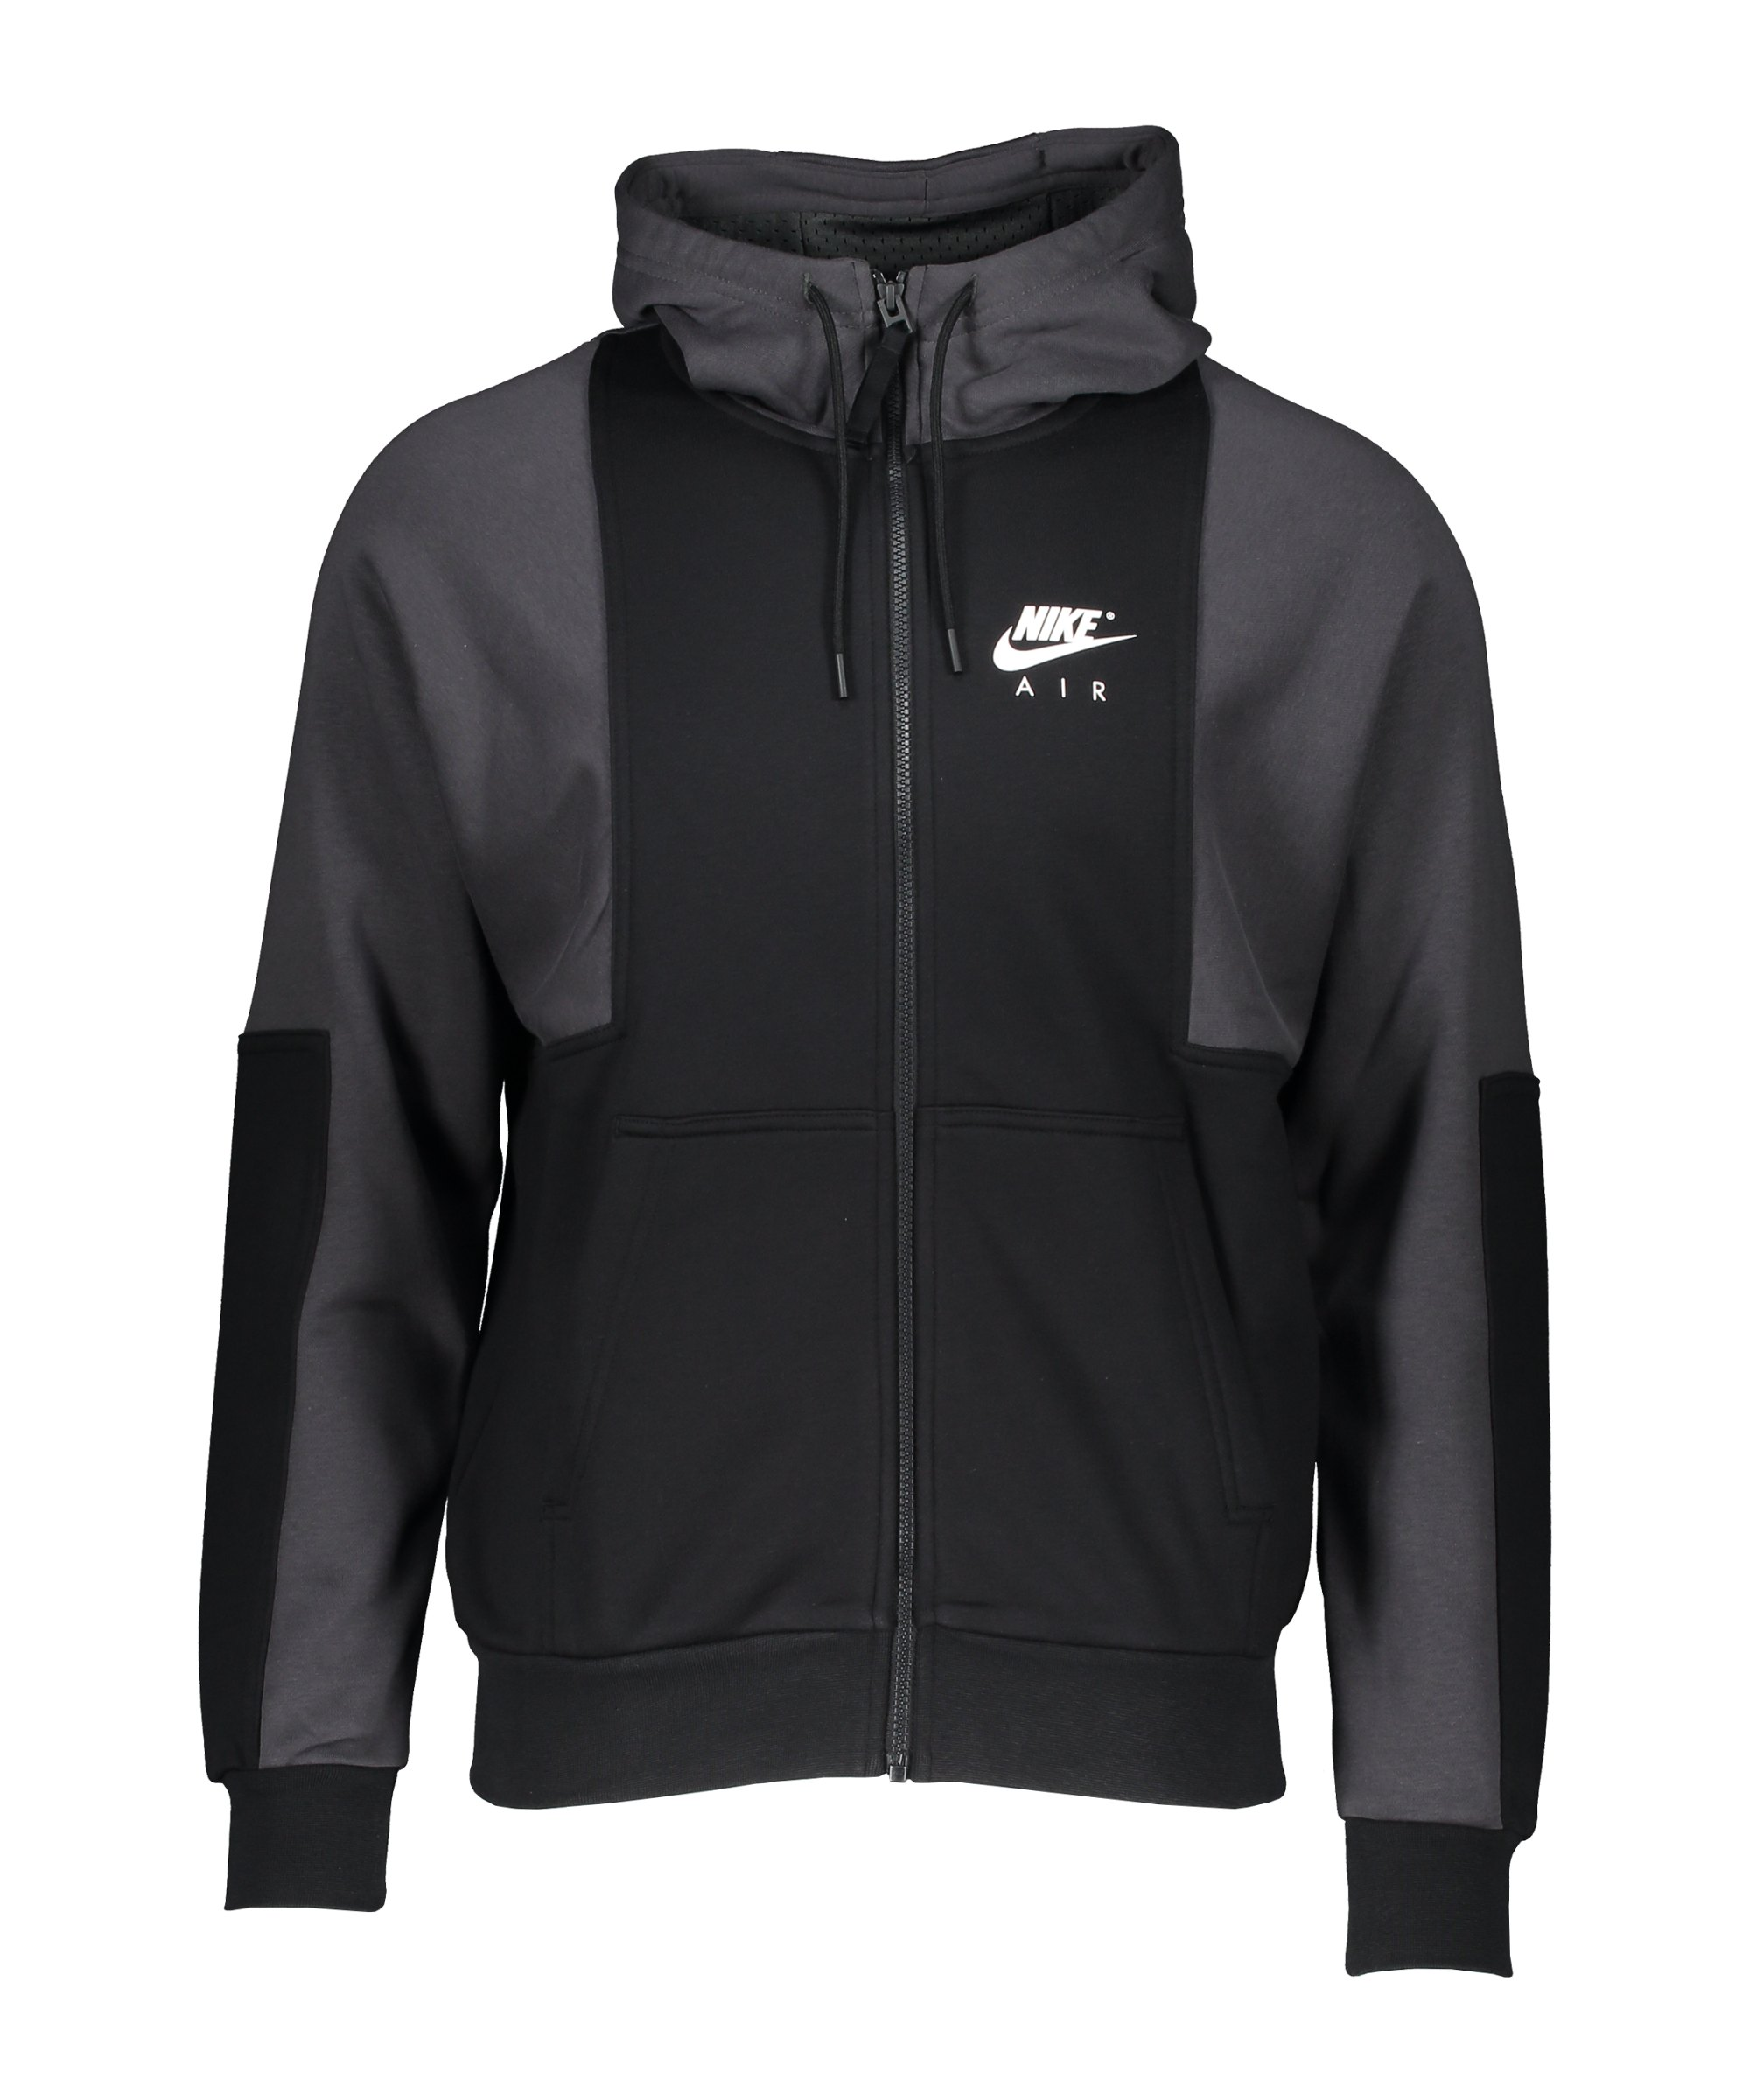 Nike Air Brushed-Back Fleece Kapuzenjacke F010 - schwarz